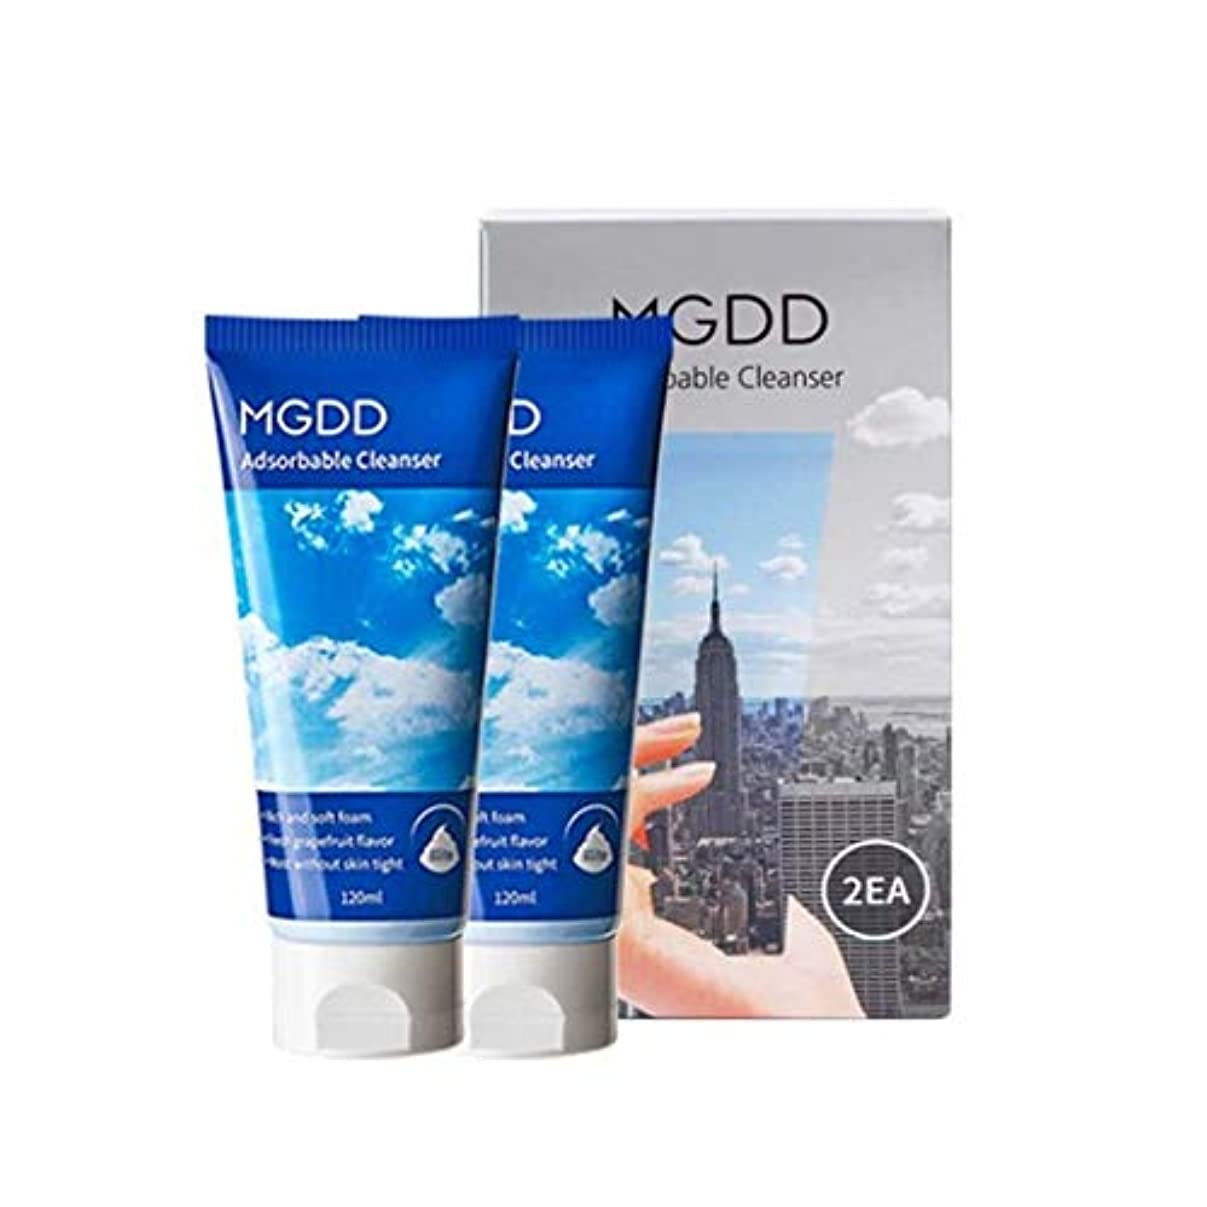 MGDD吸着クレンザー120mlx2本セット毛穴洗浄韓国コスメ、MGDD Adsorbable Cleanser 120ml x 2ea Set Pore Care Korean Cosmetics [並行輸入品]